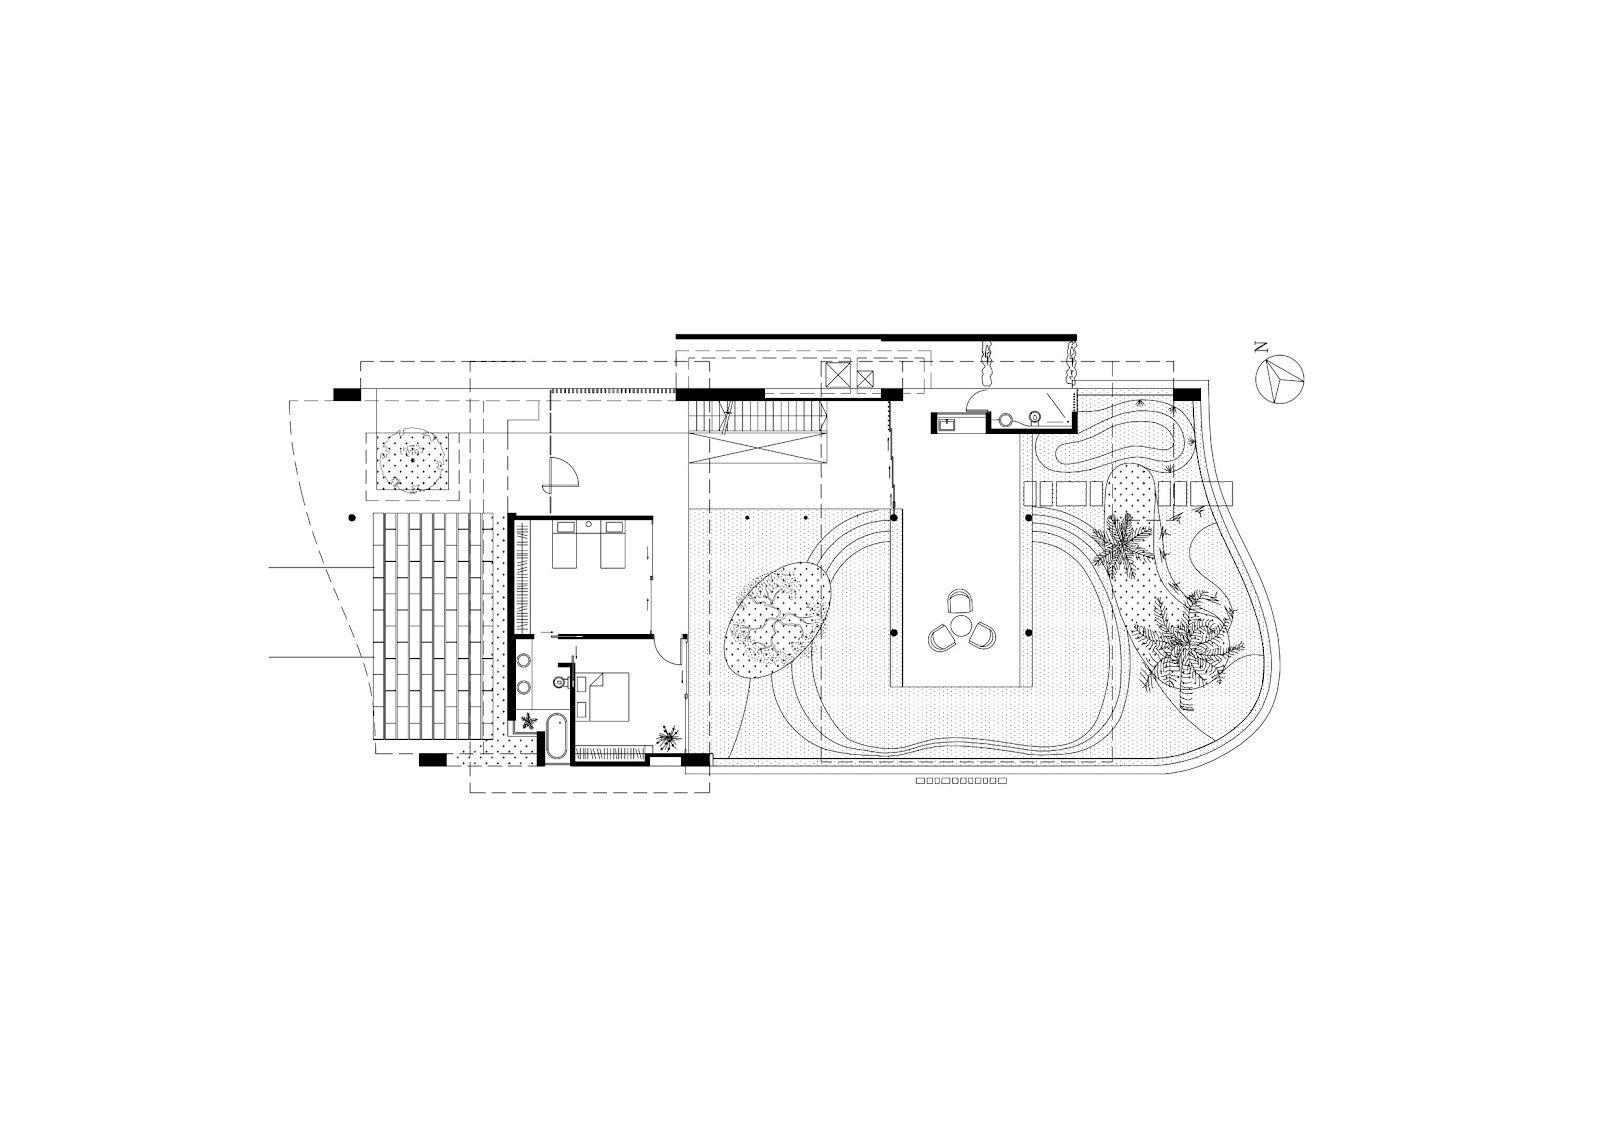 Modern luxury tropical house floor plans   Behance   Pinterest ...